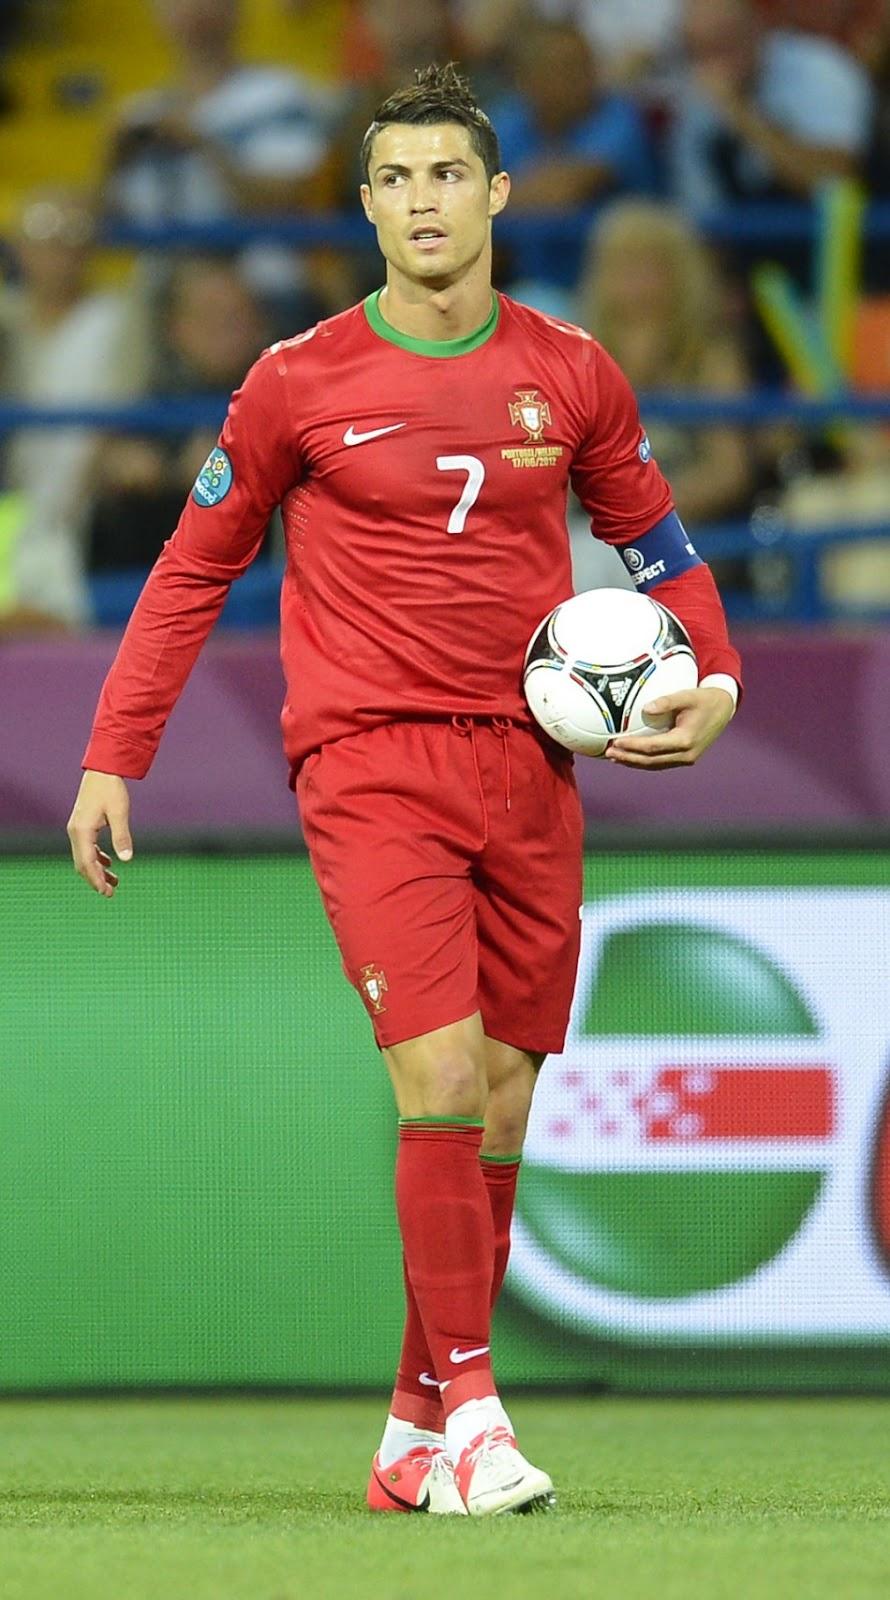 Football cristiano ronaldo for Cristiano ronaldo